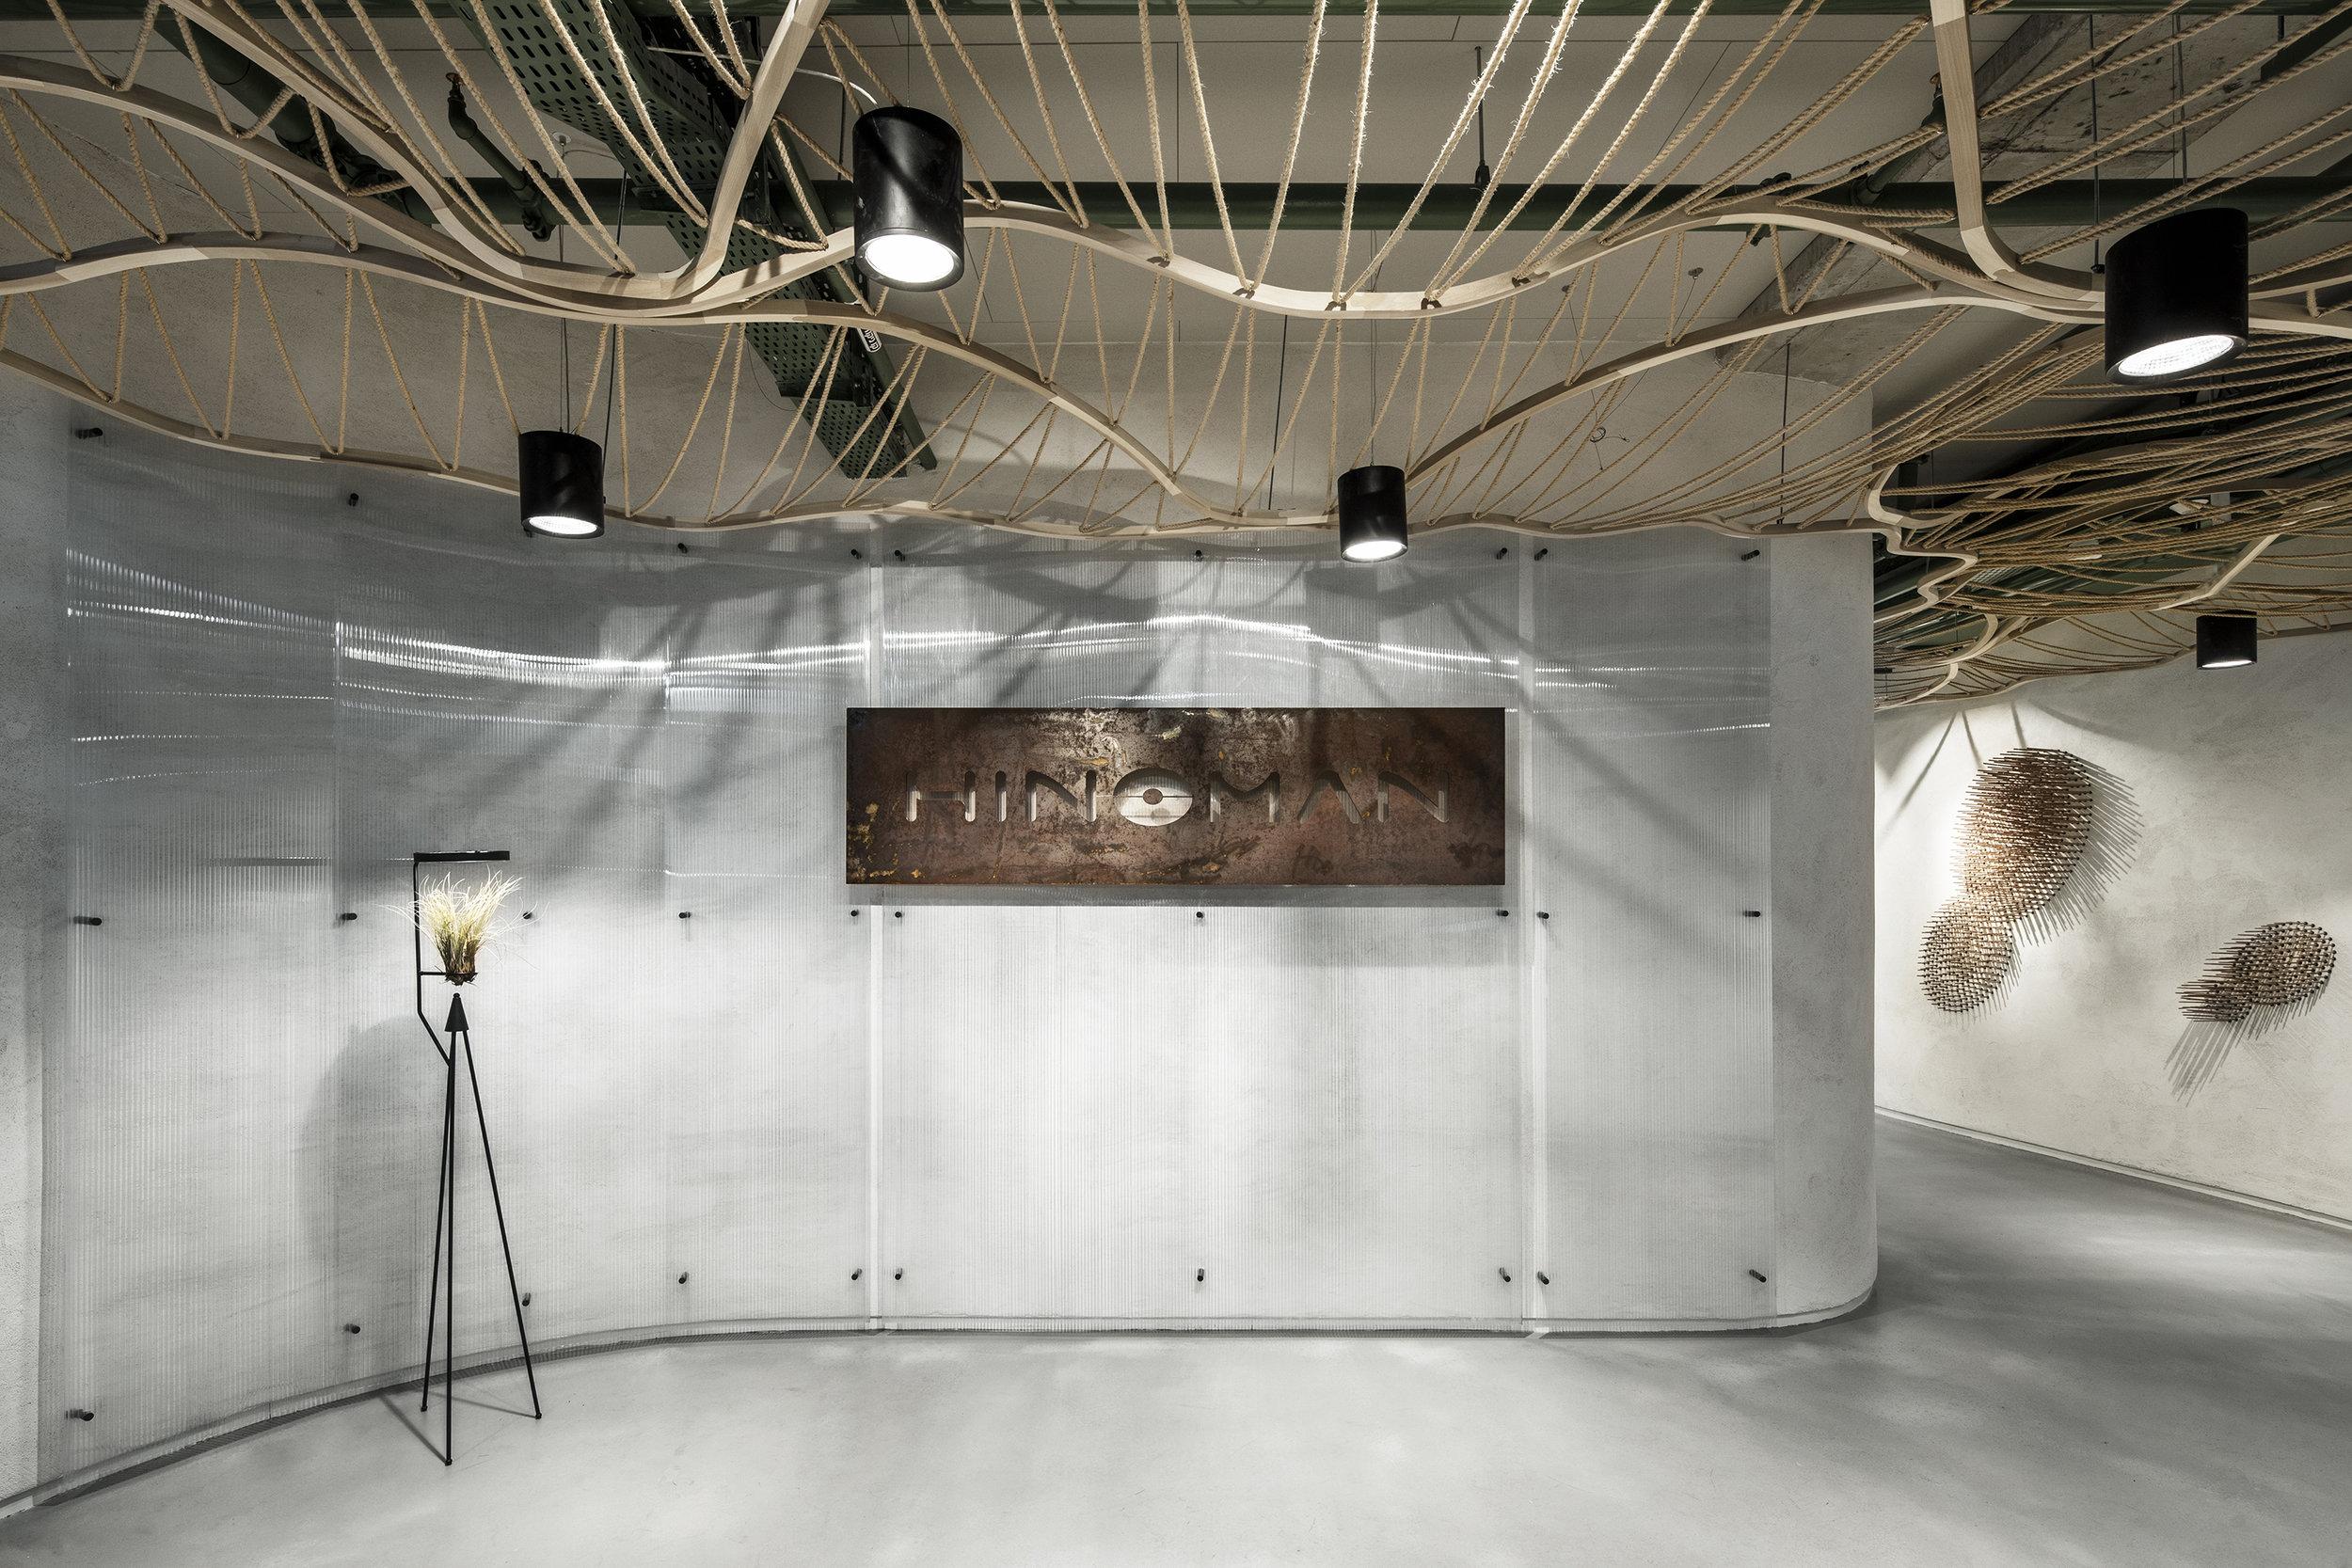 HINNOMAN - ROY DAVID ARCHTECTURE - STUDIO - סטודיו רואי דוד - אדריכלים (1).jpg